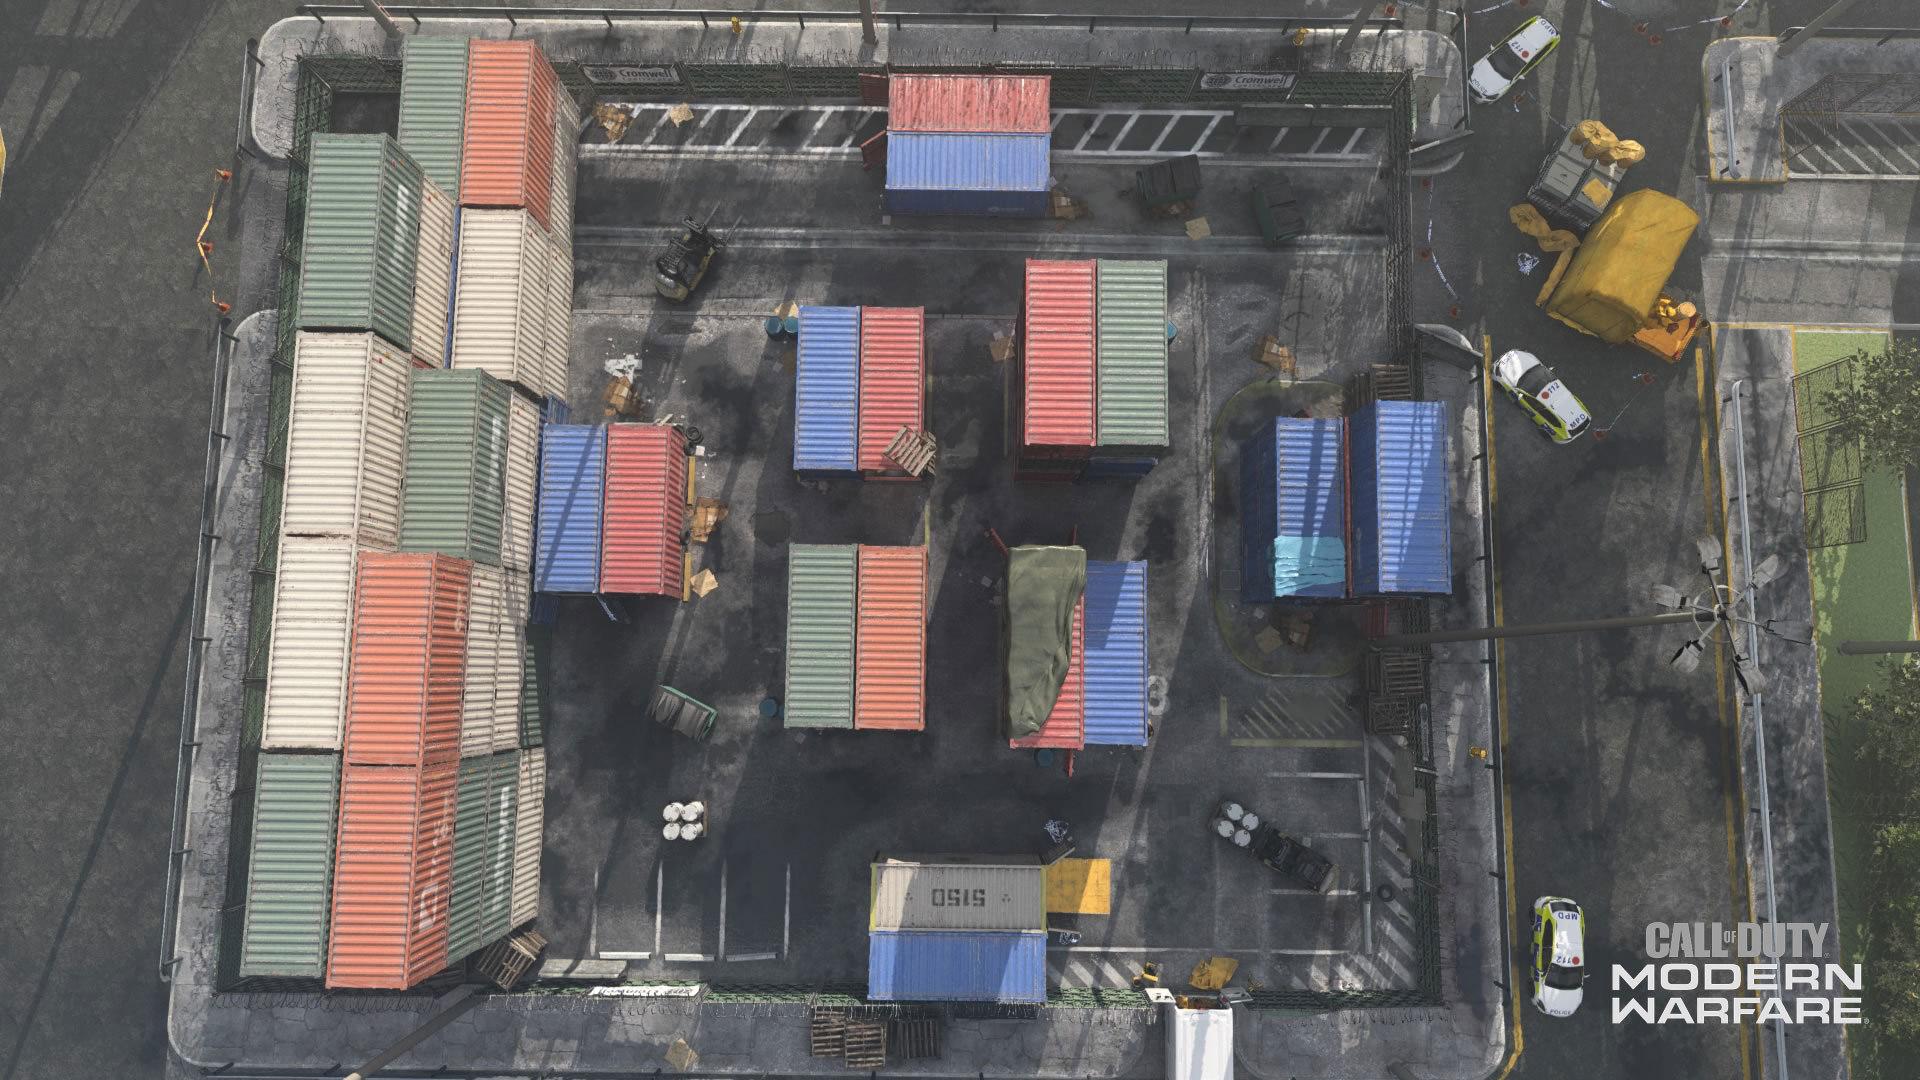 yang fy iceworld07 shipment2019 - Call Of Duty: Modern Warfare's crowded April Fool's Shipment playlist returns